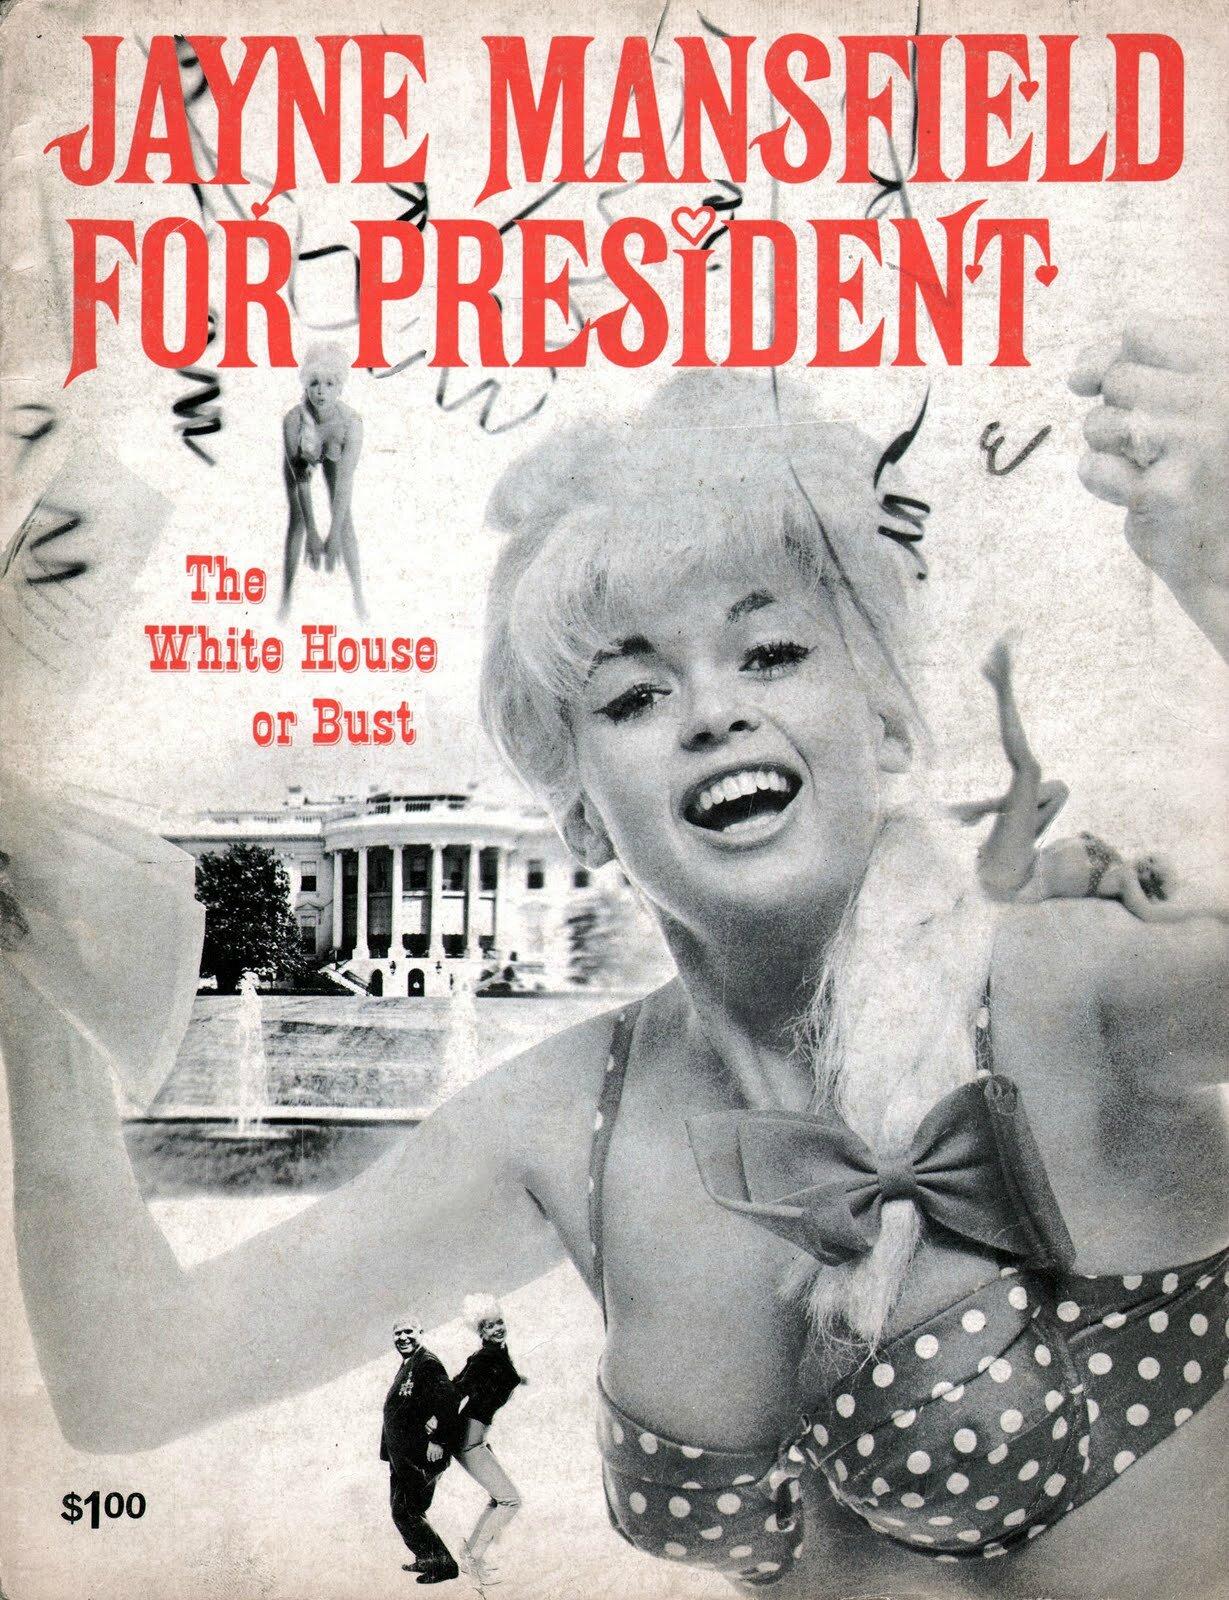 jayne_bikini_poids-1964-jayne_for_president-01